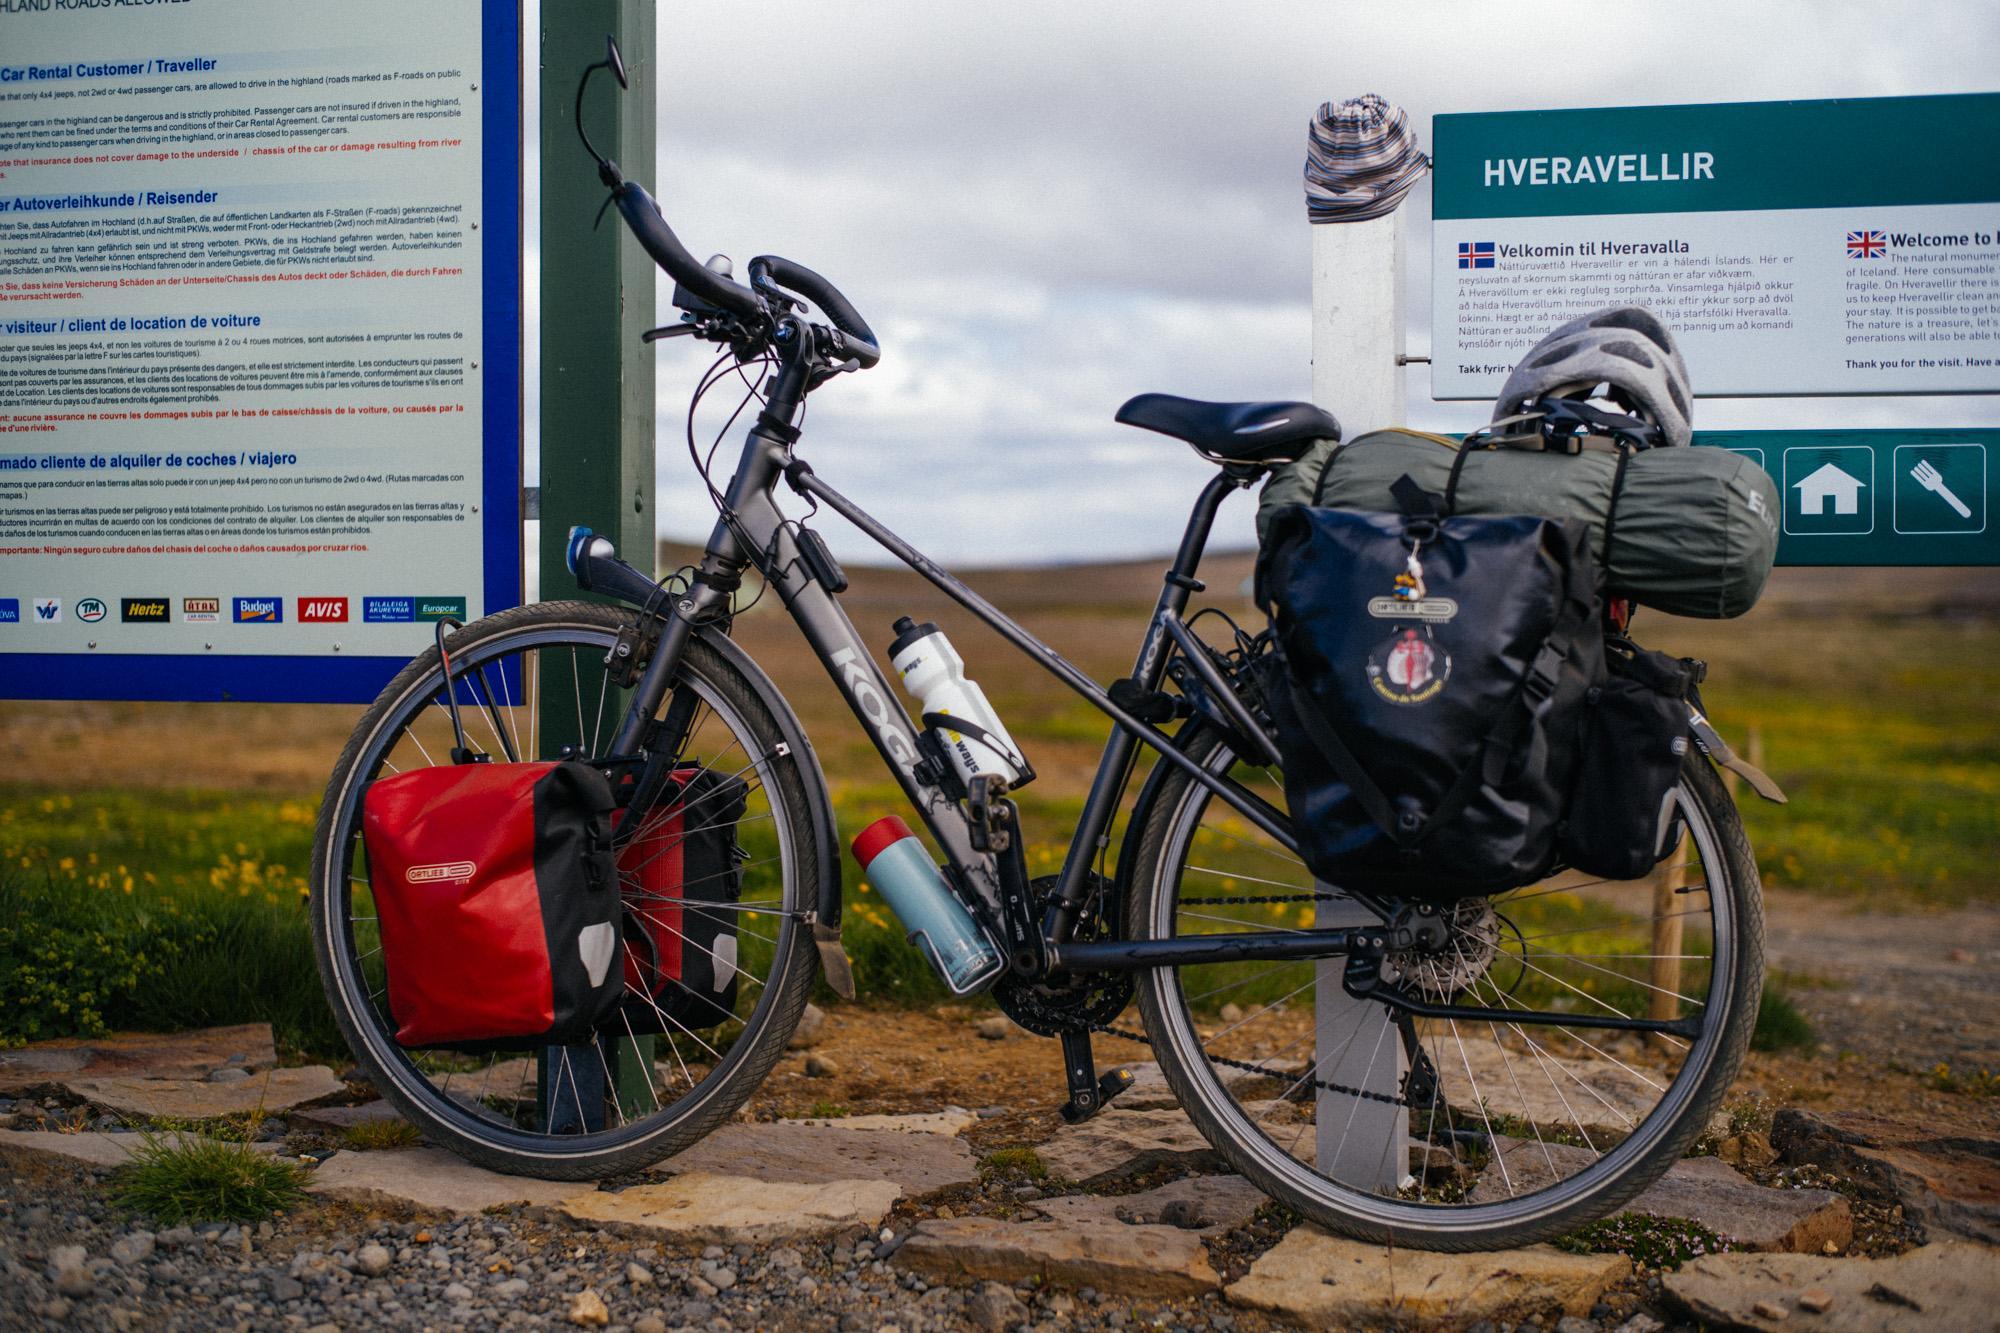 Cyclotourist